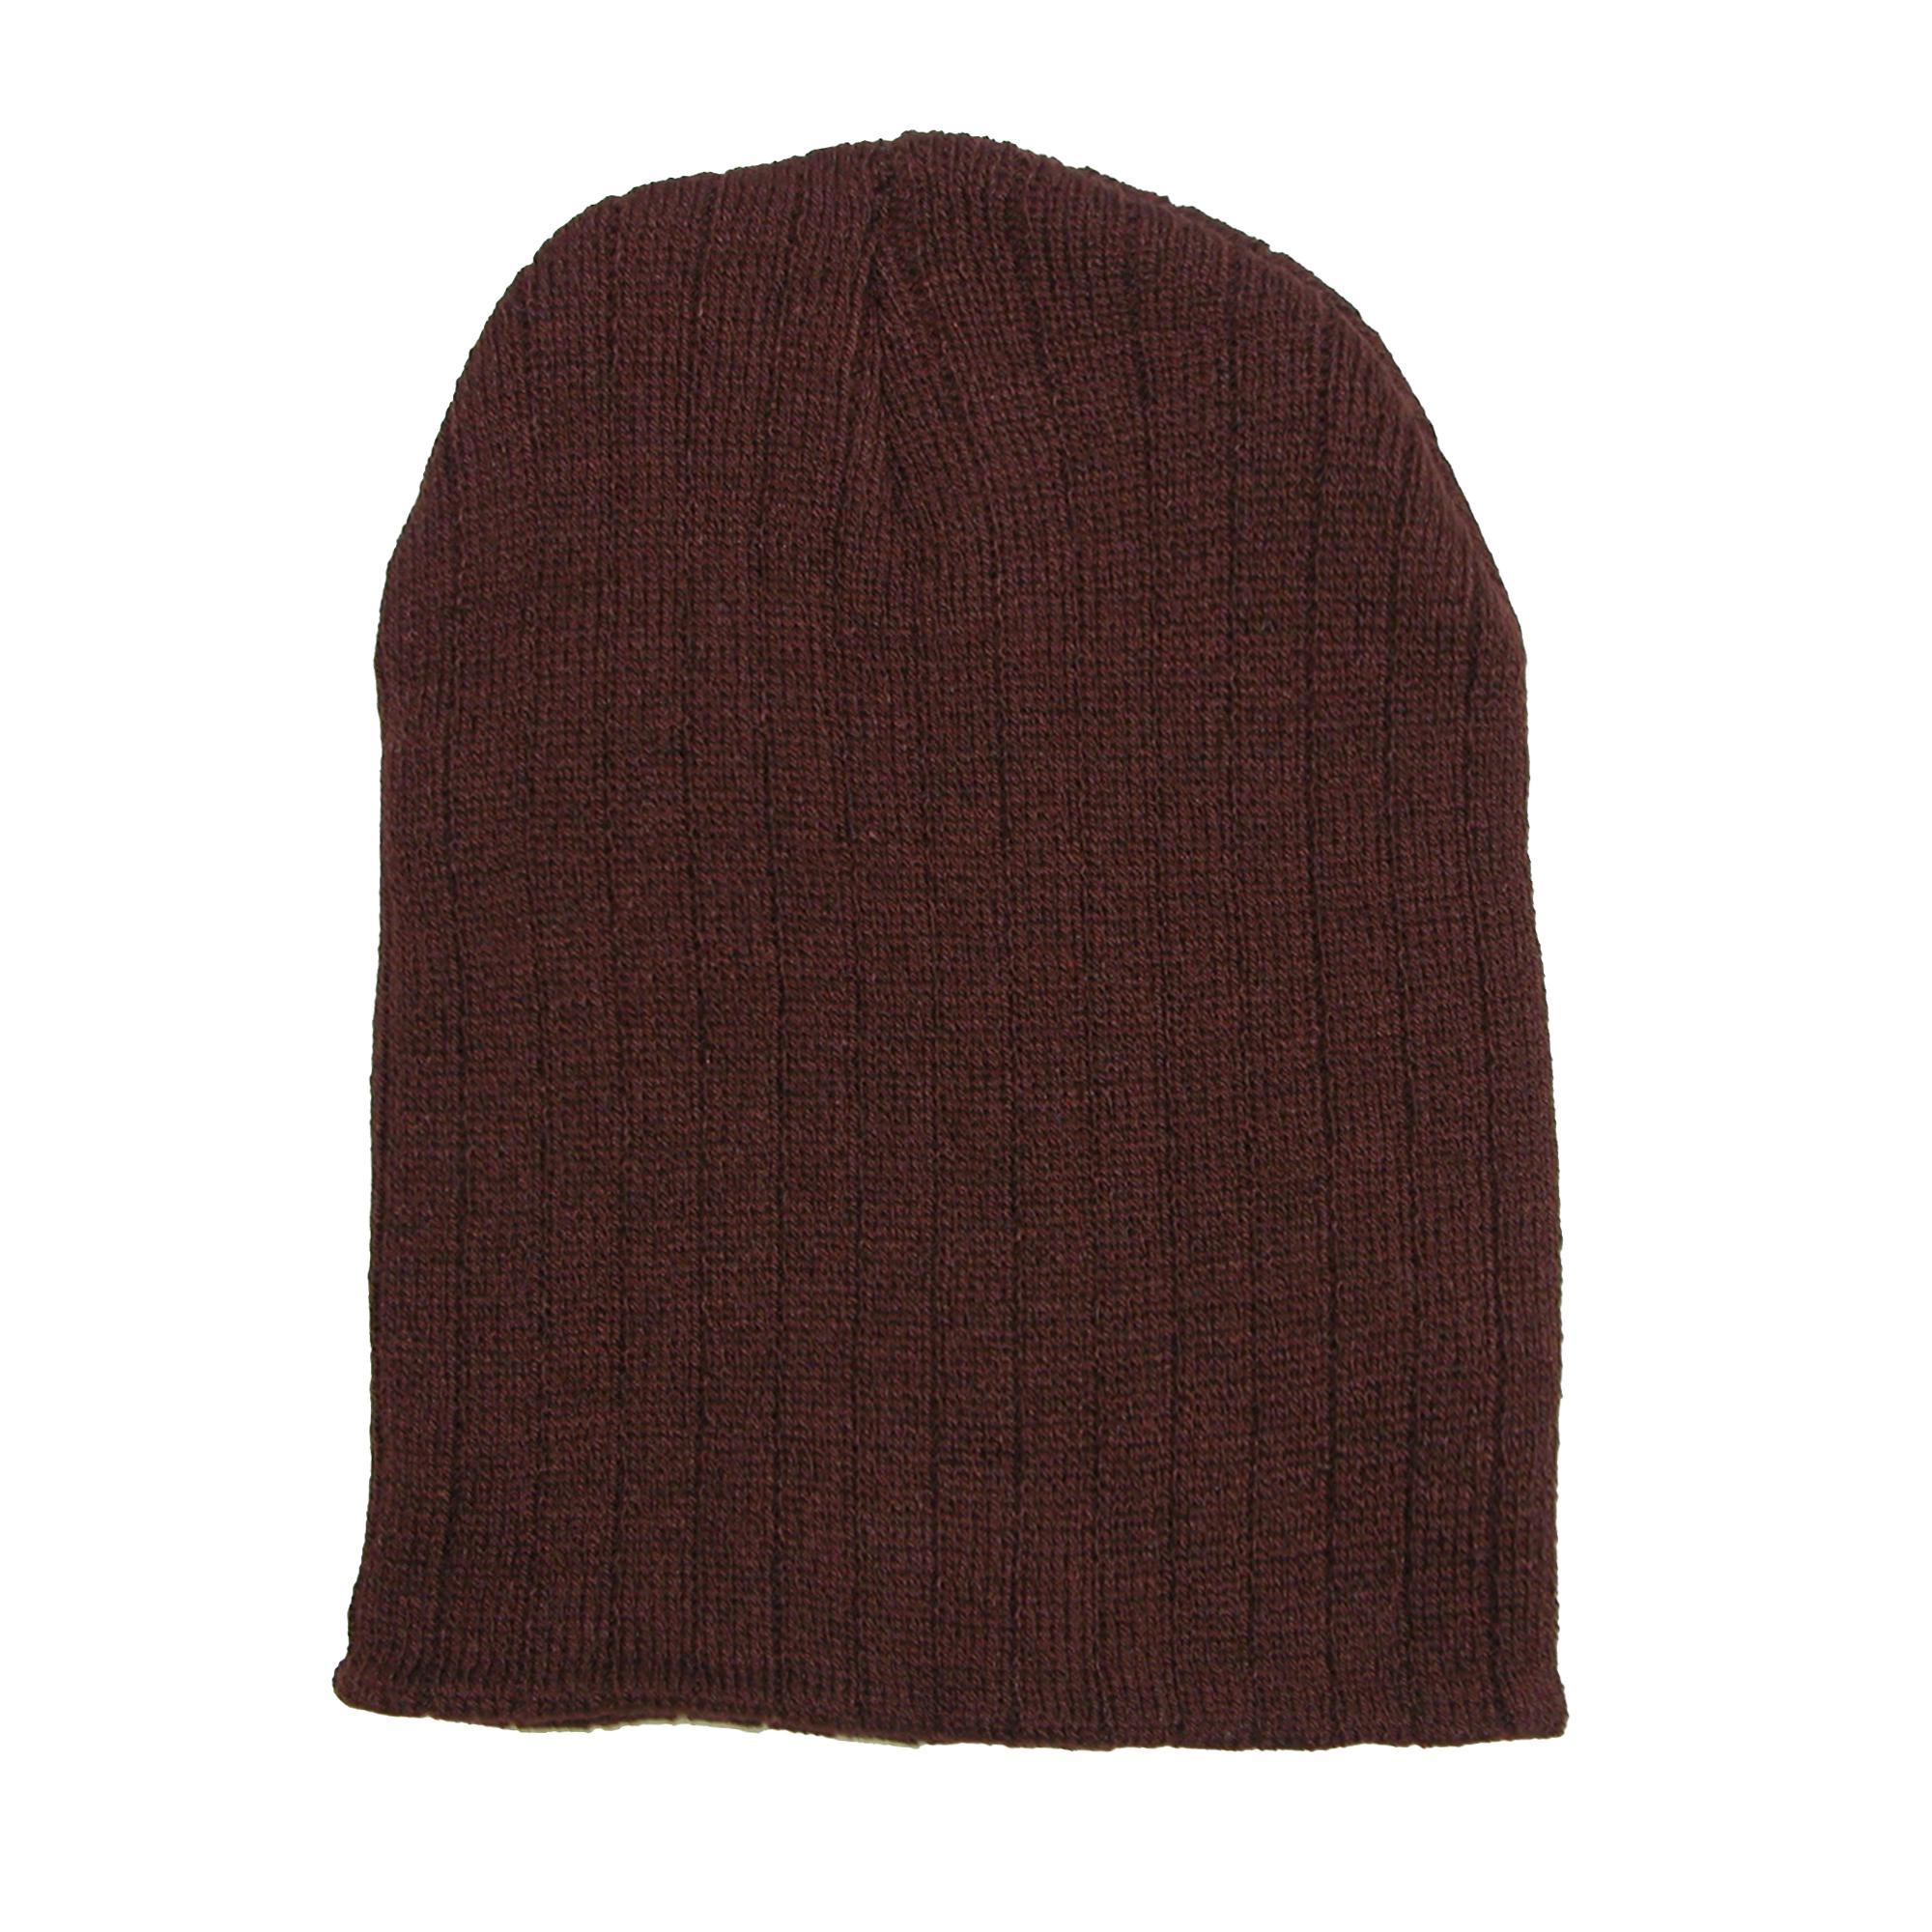 Winter Stocking Cap 83